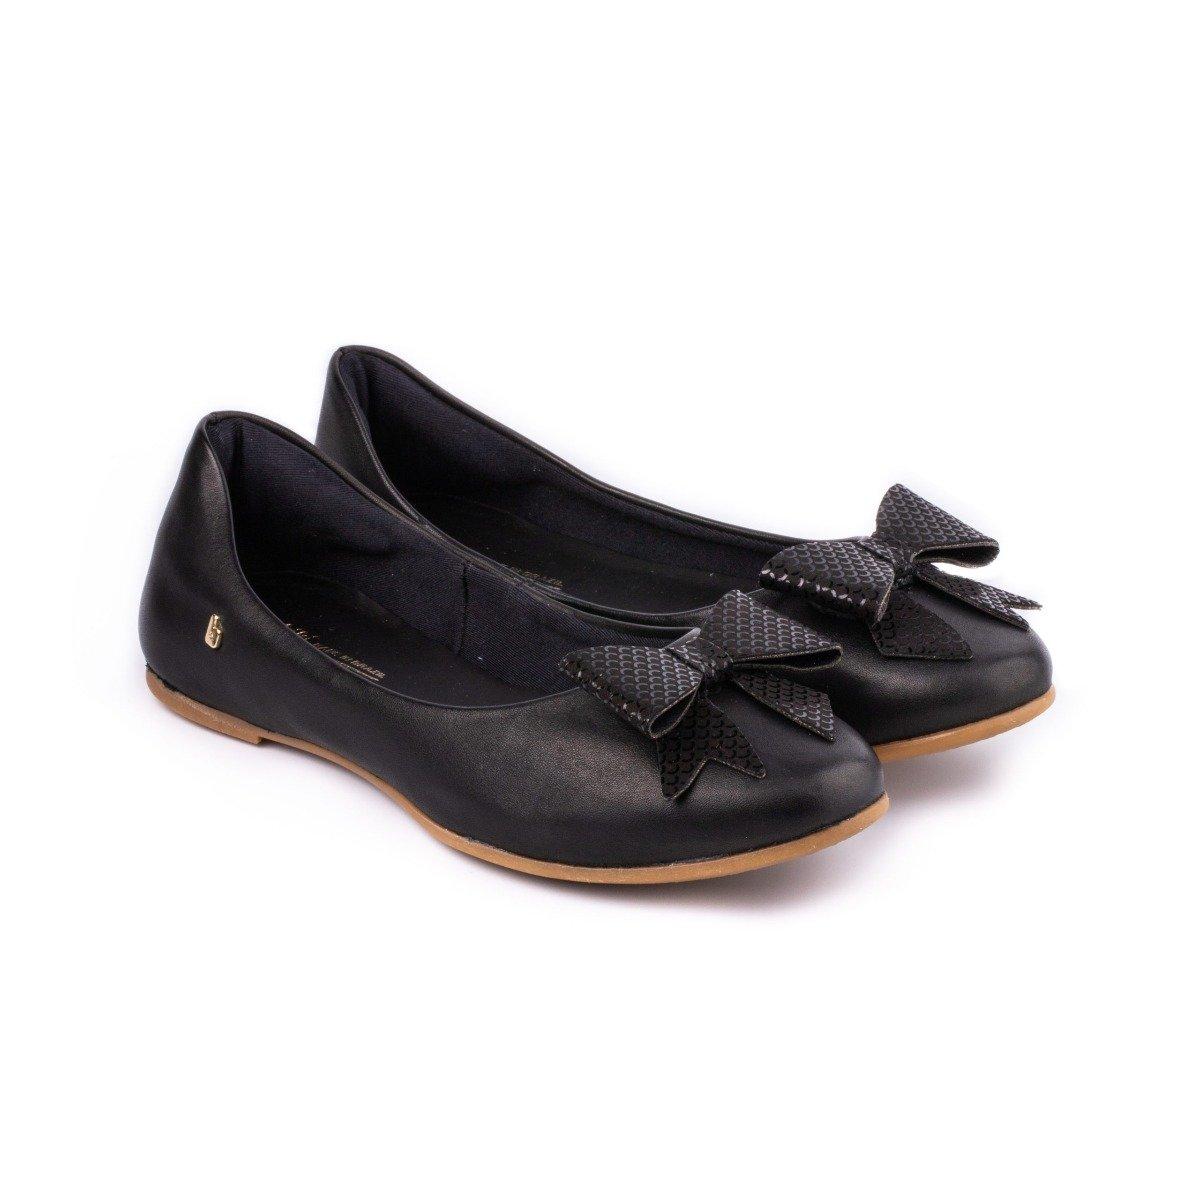 Balerini cu funda Bibi Shoes Renascence Kids imagine